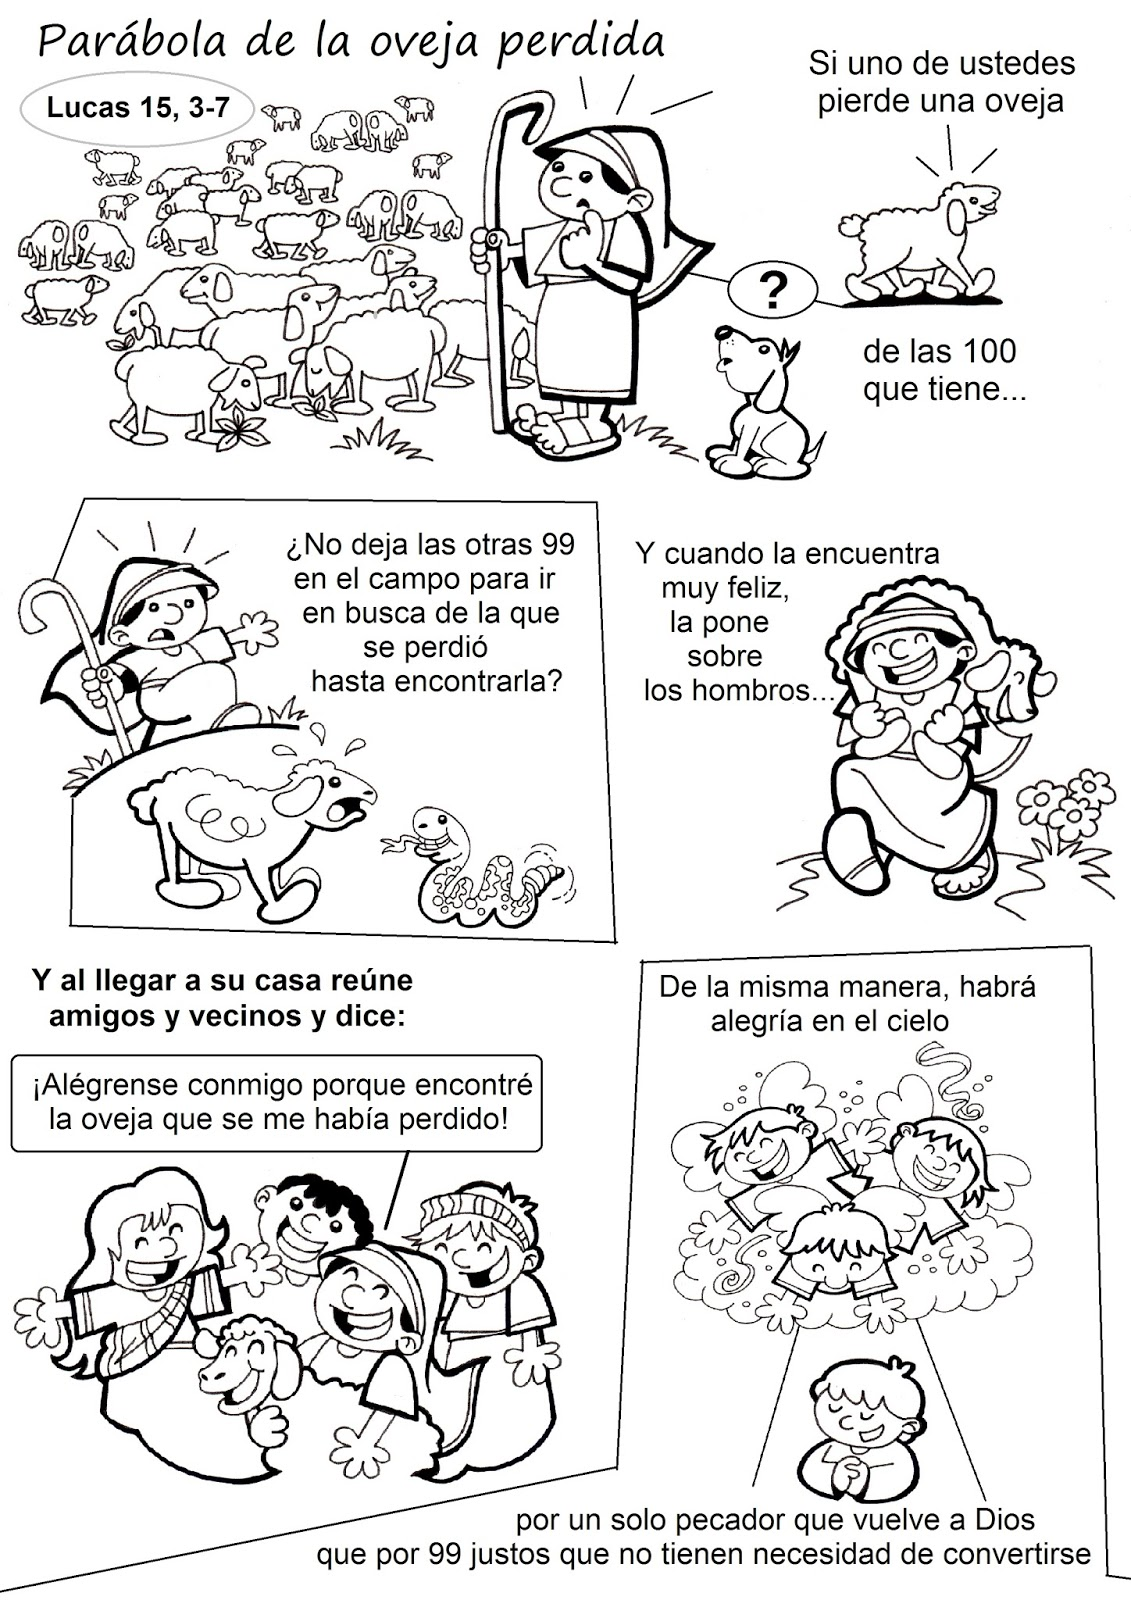 La Catequesis El Blog De Sandra Recursos Catequesis Parábola